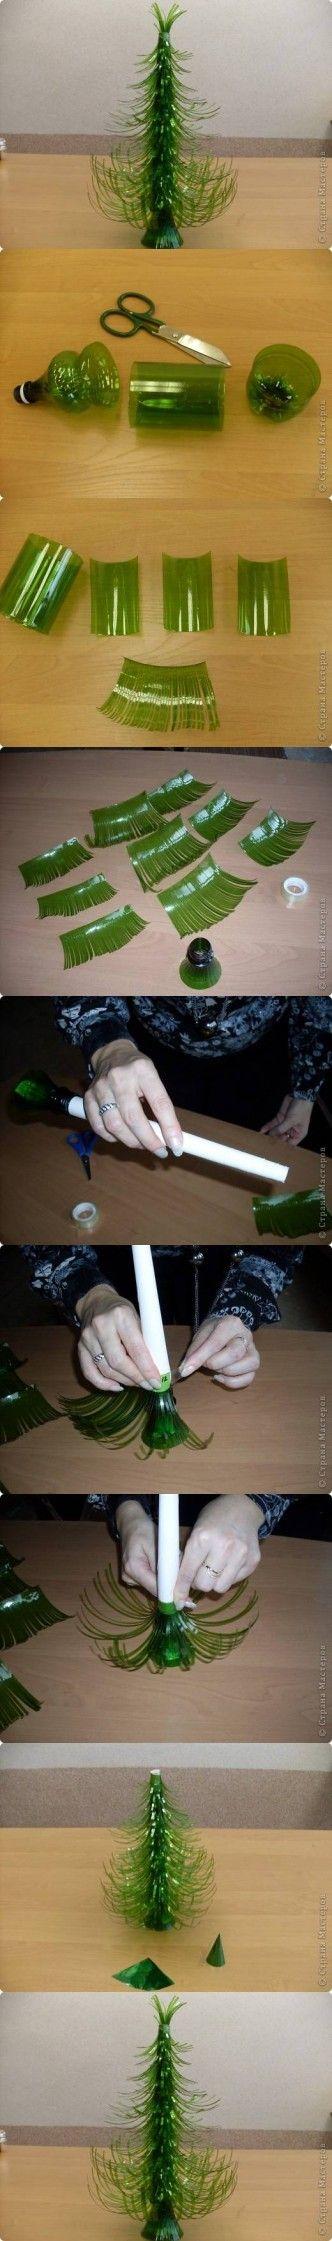 DIY Plastic Bottle Christmas Trees DIY Projects @Paulina P P Cebrero un arbol ke no lametariamos perder XD